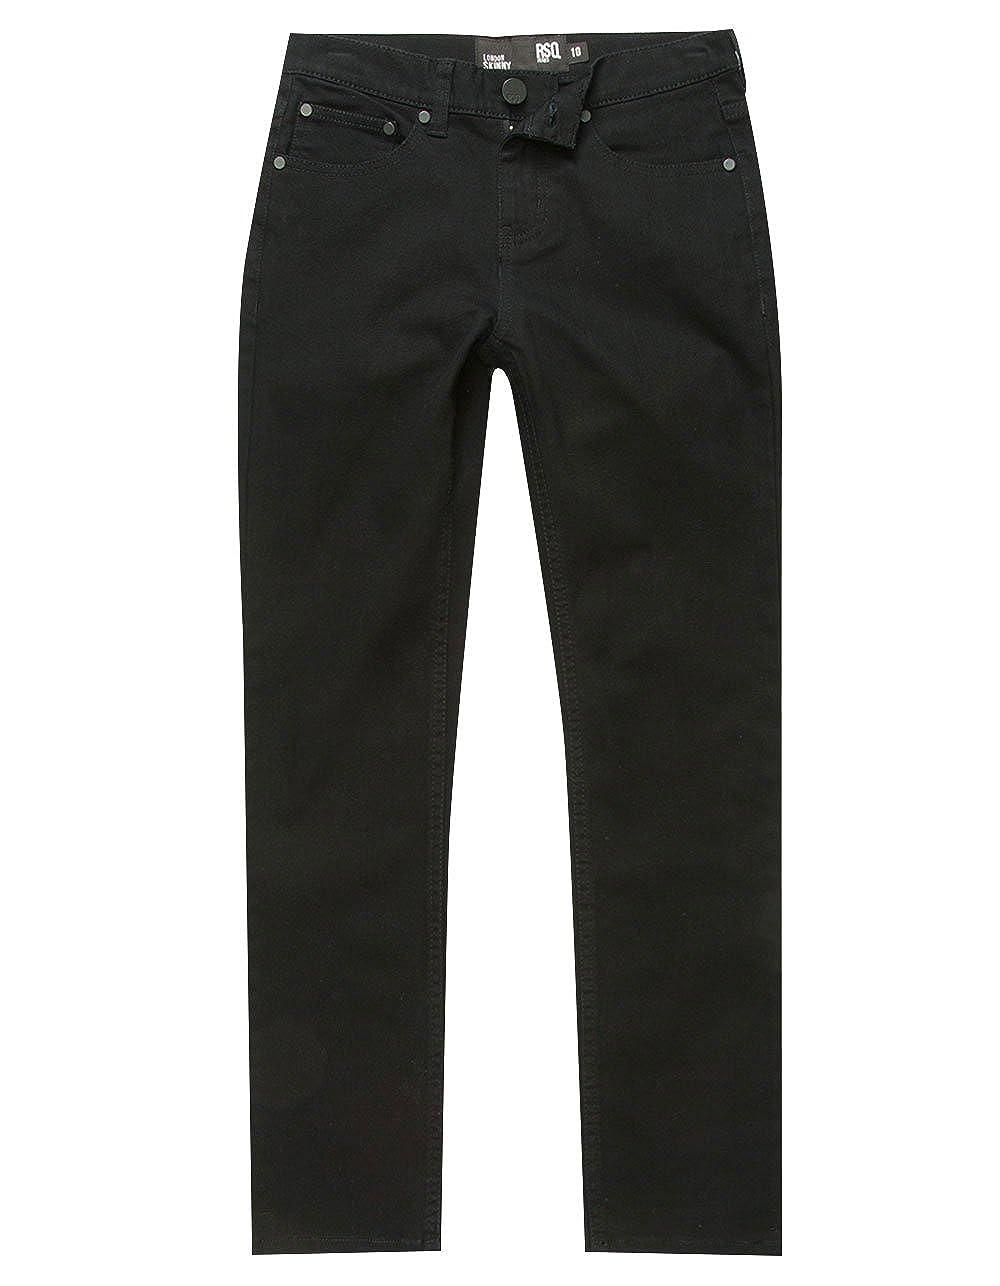 Rsq London Boys Skinny Stretch Jeans 302155